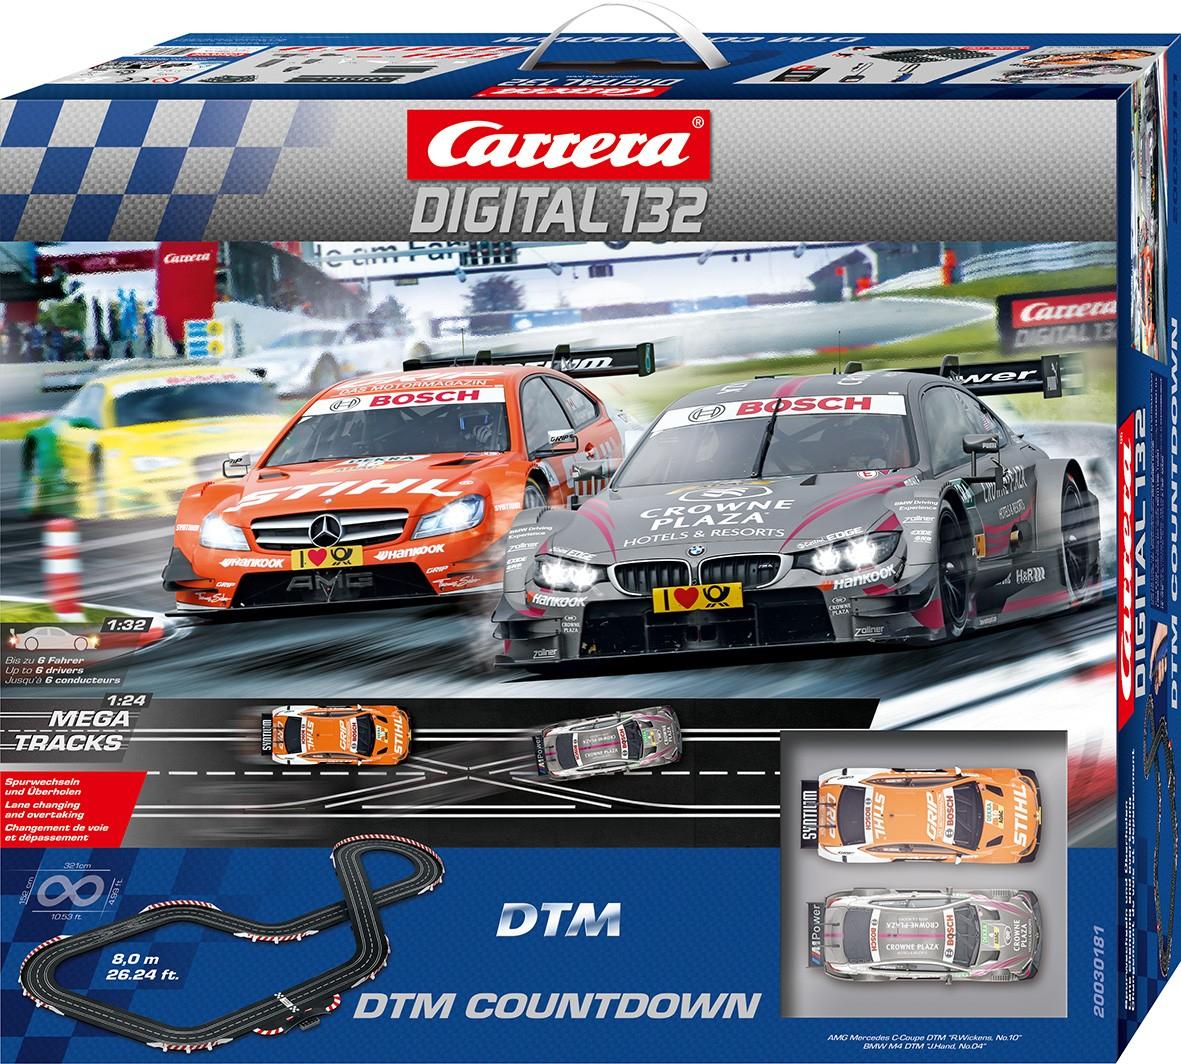 MÜLLER On- & Offline: Carrera Digital 132 - DTM Countdown für 199 € statt 249 €